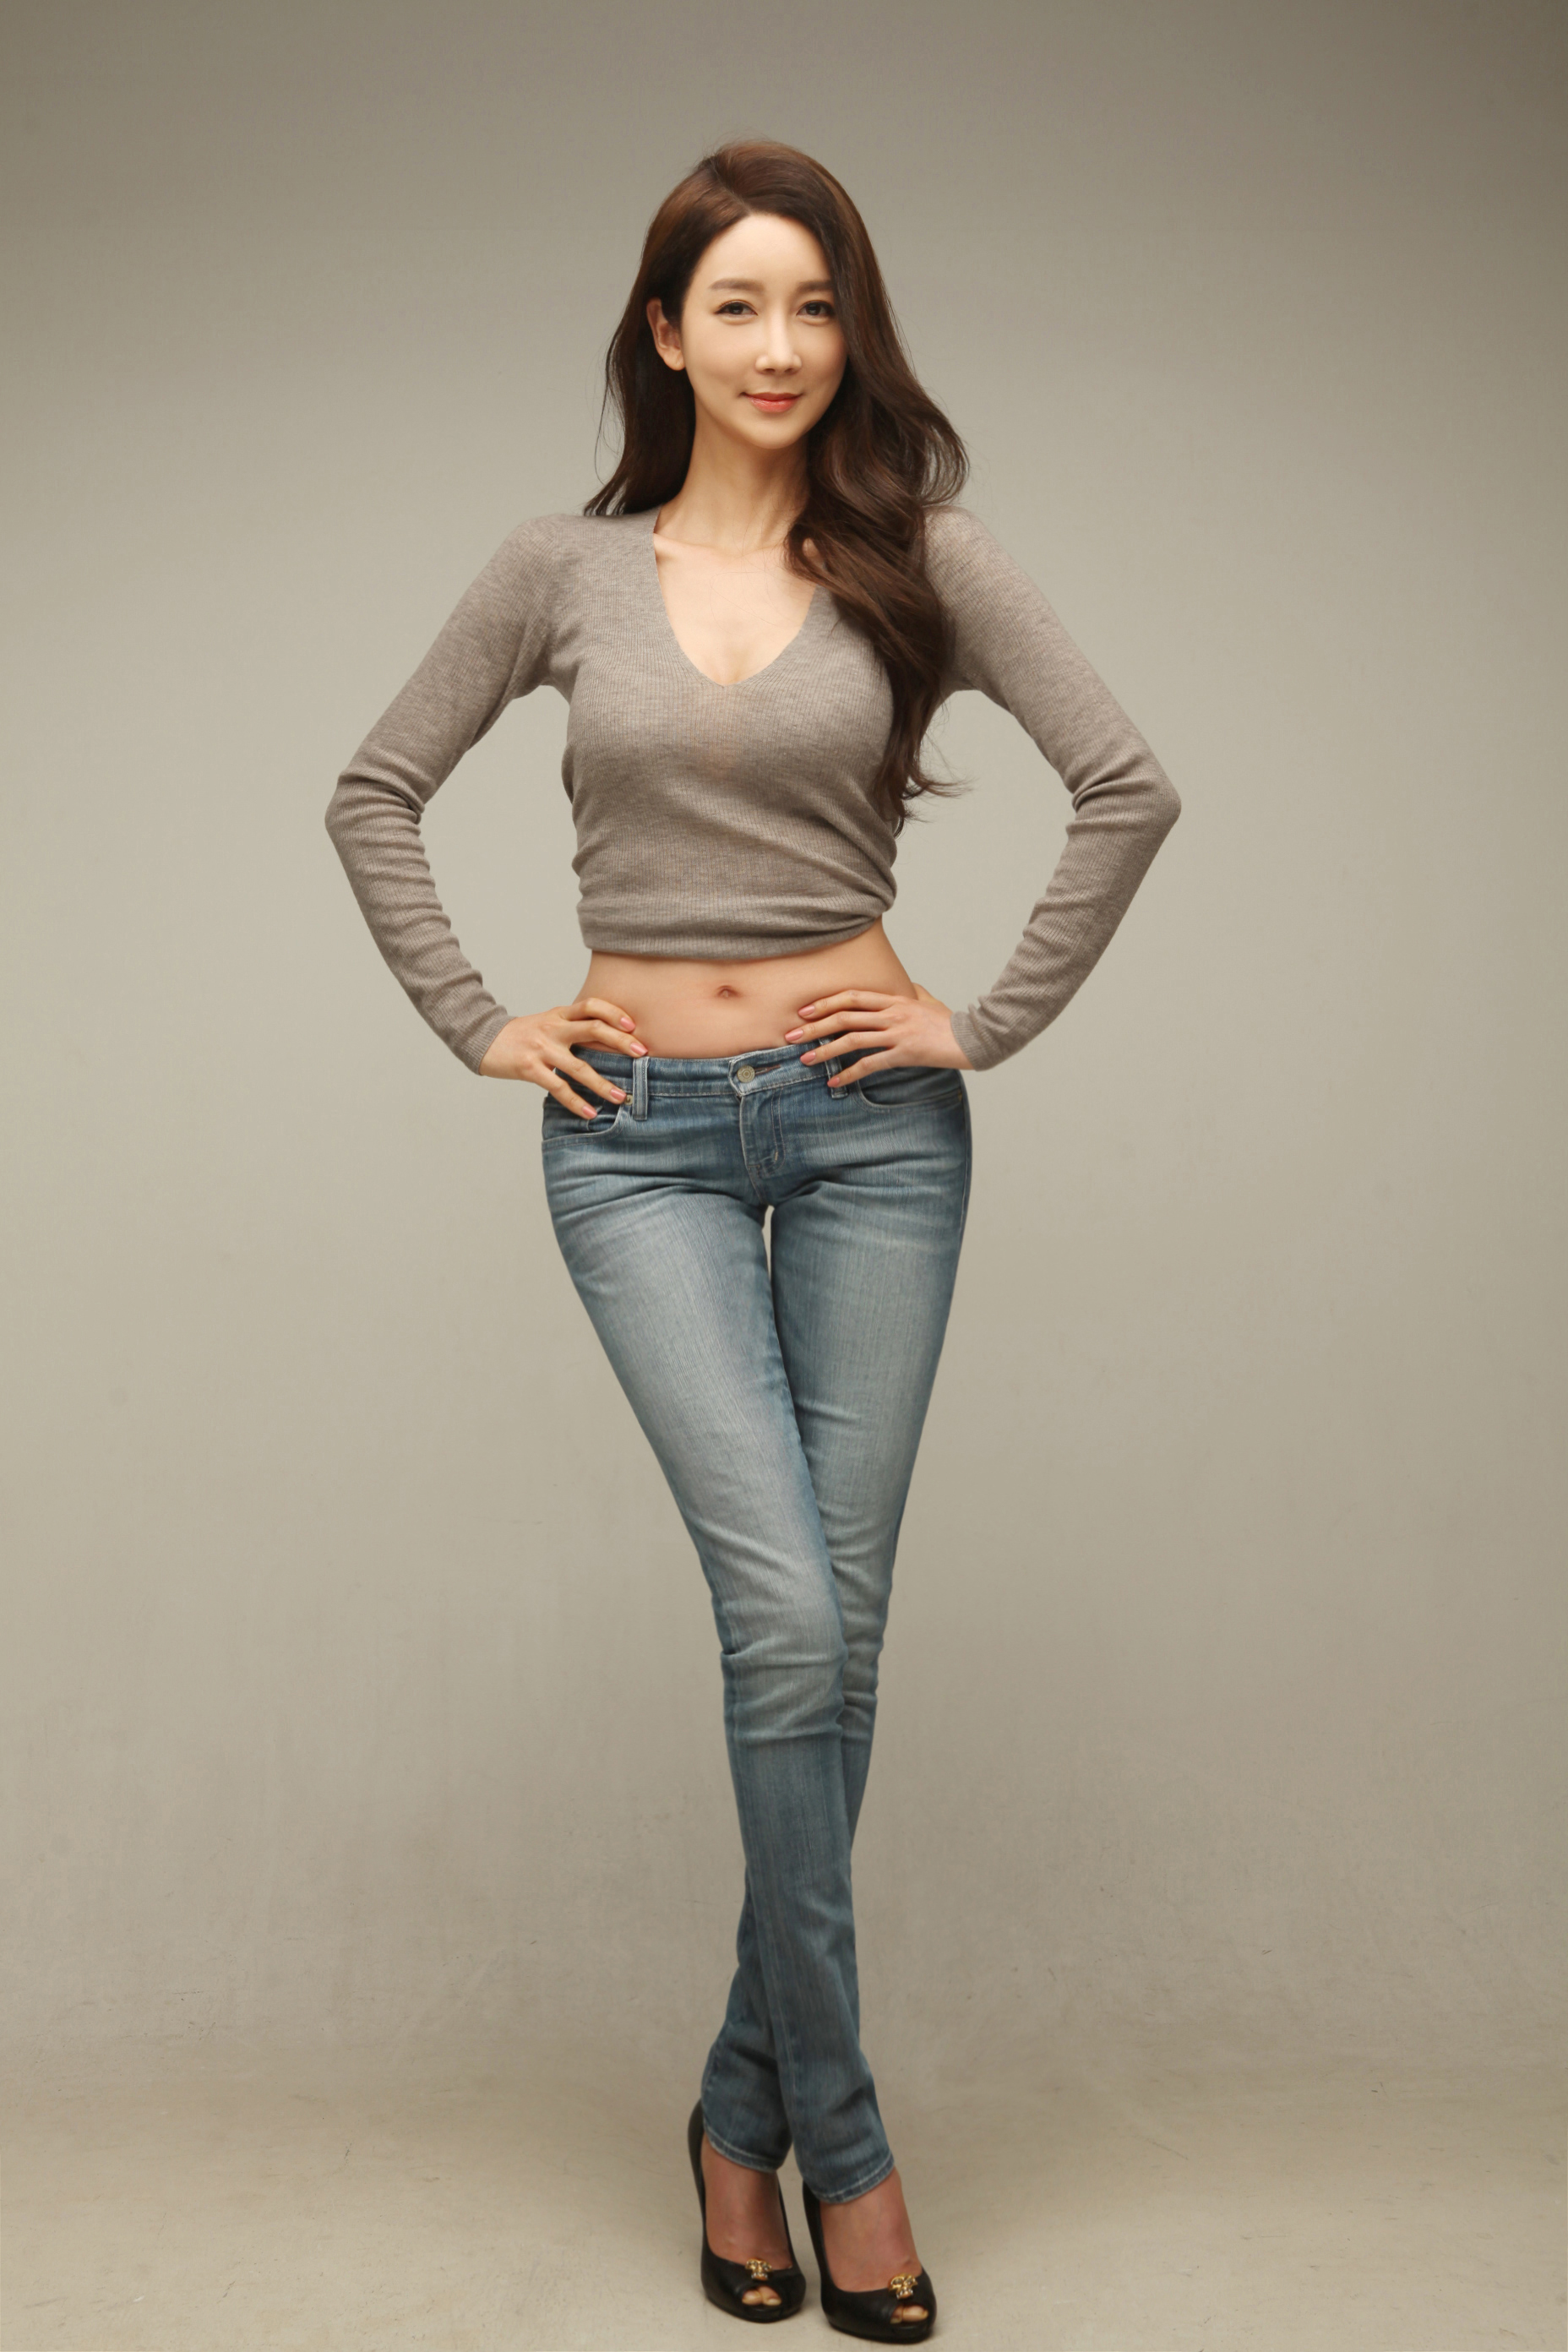 Model Factory Korean Female Model YangYH